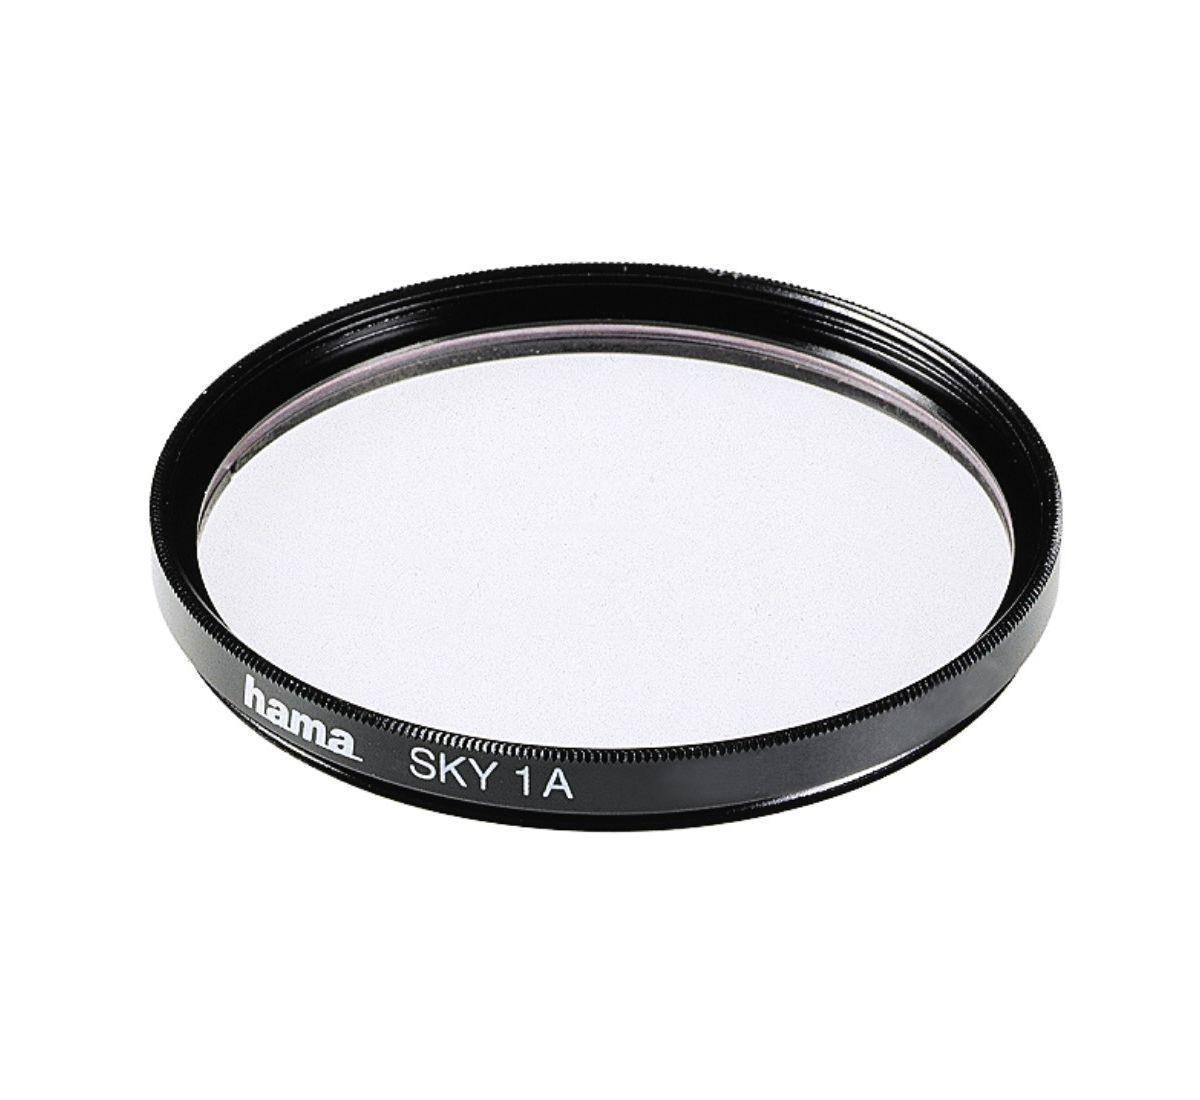 Hama Skylight-Filter 1 A (LA+10), AR coated, 58...